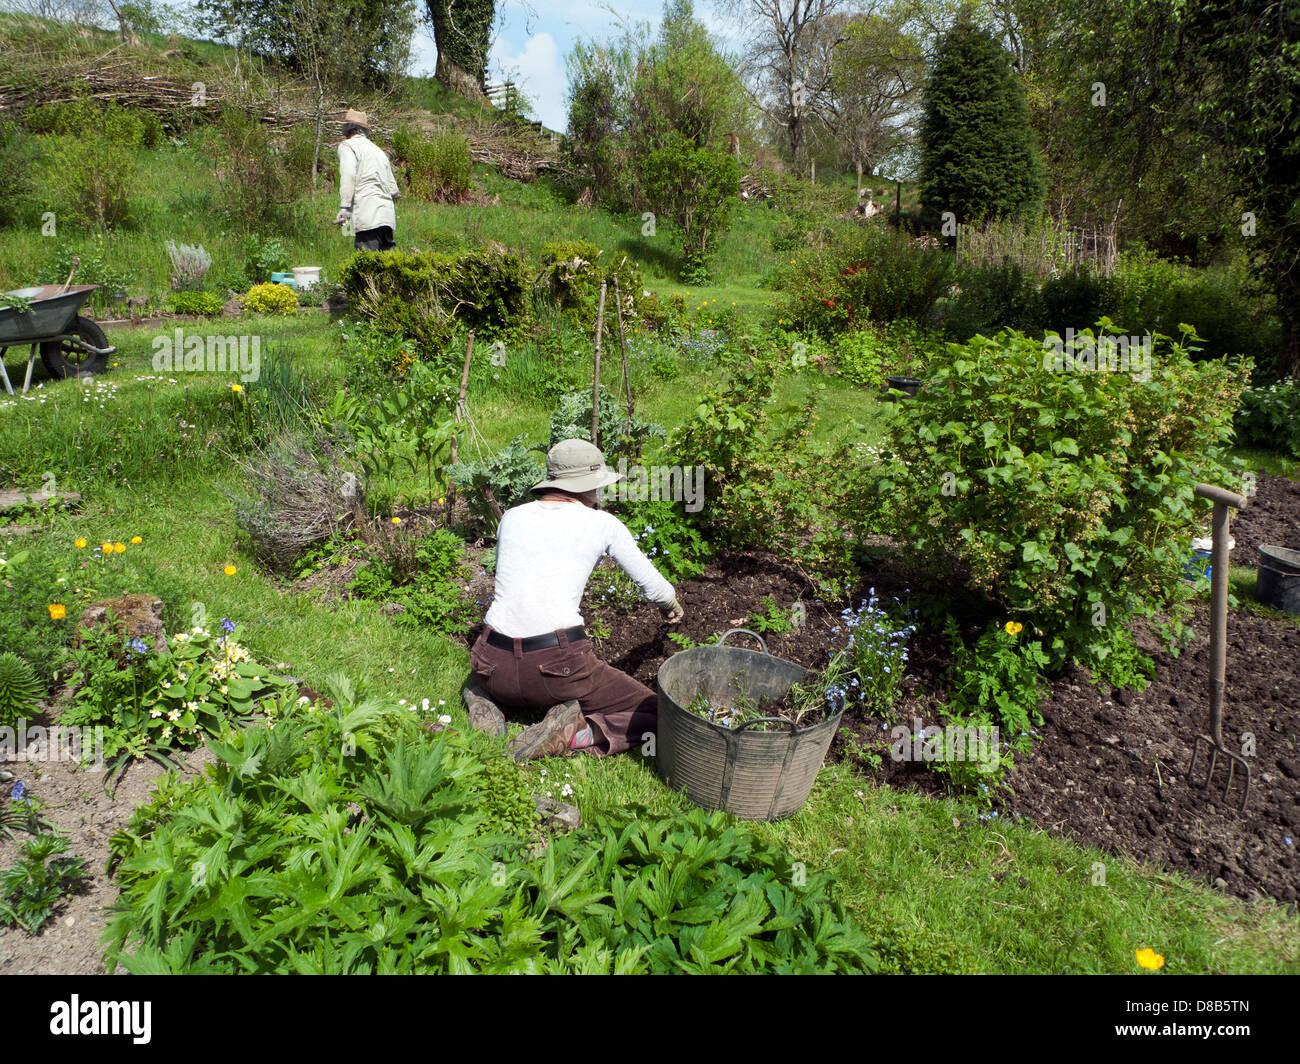 people gardening in the vegetable garden in may in spring sunshine in carmarthenshire wales uk kathy dewitt